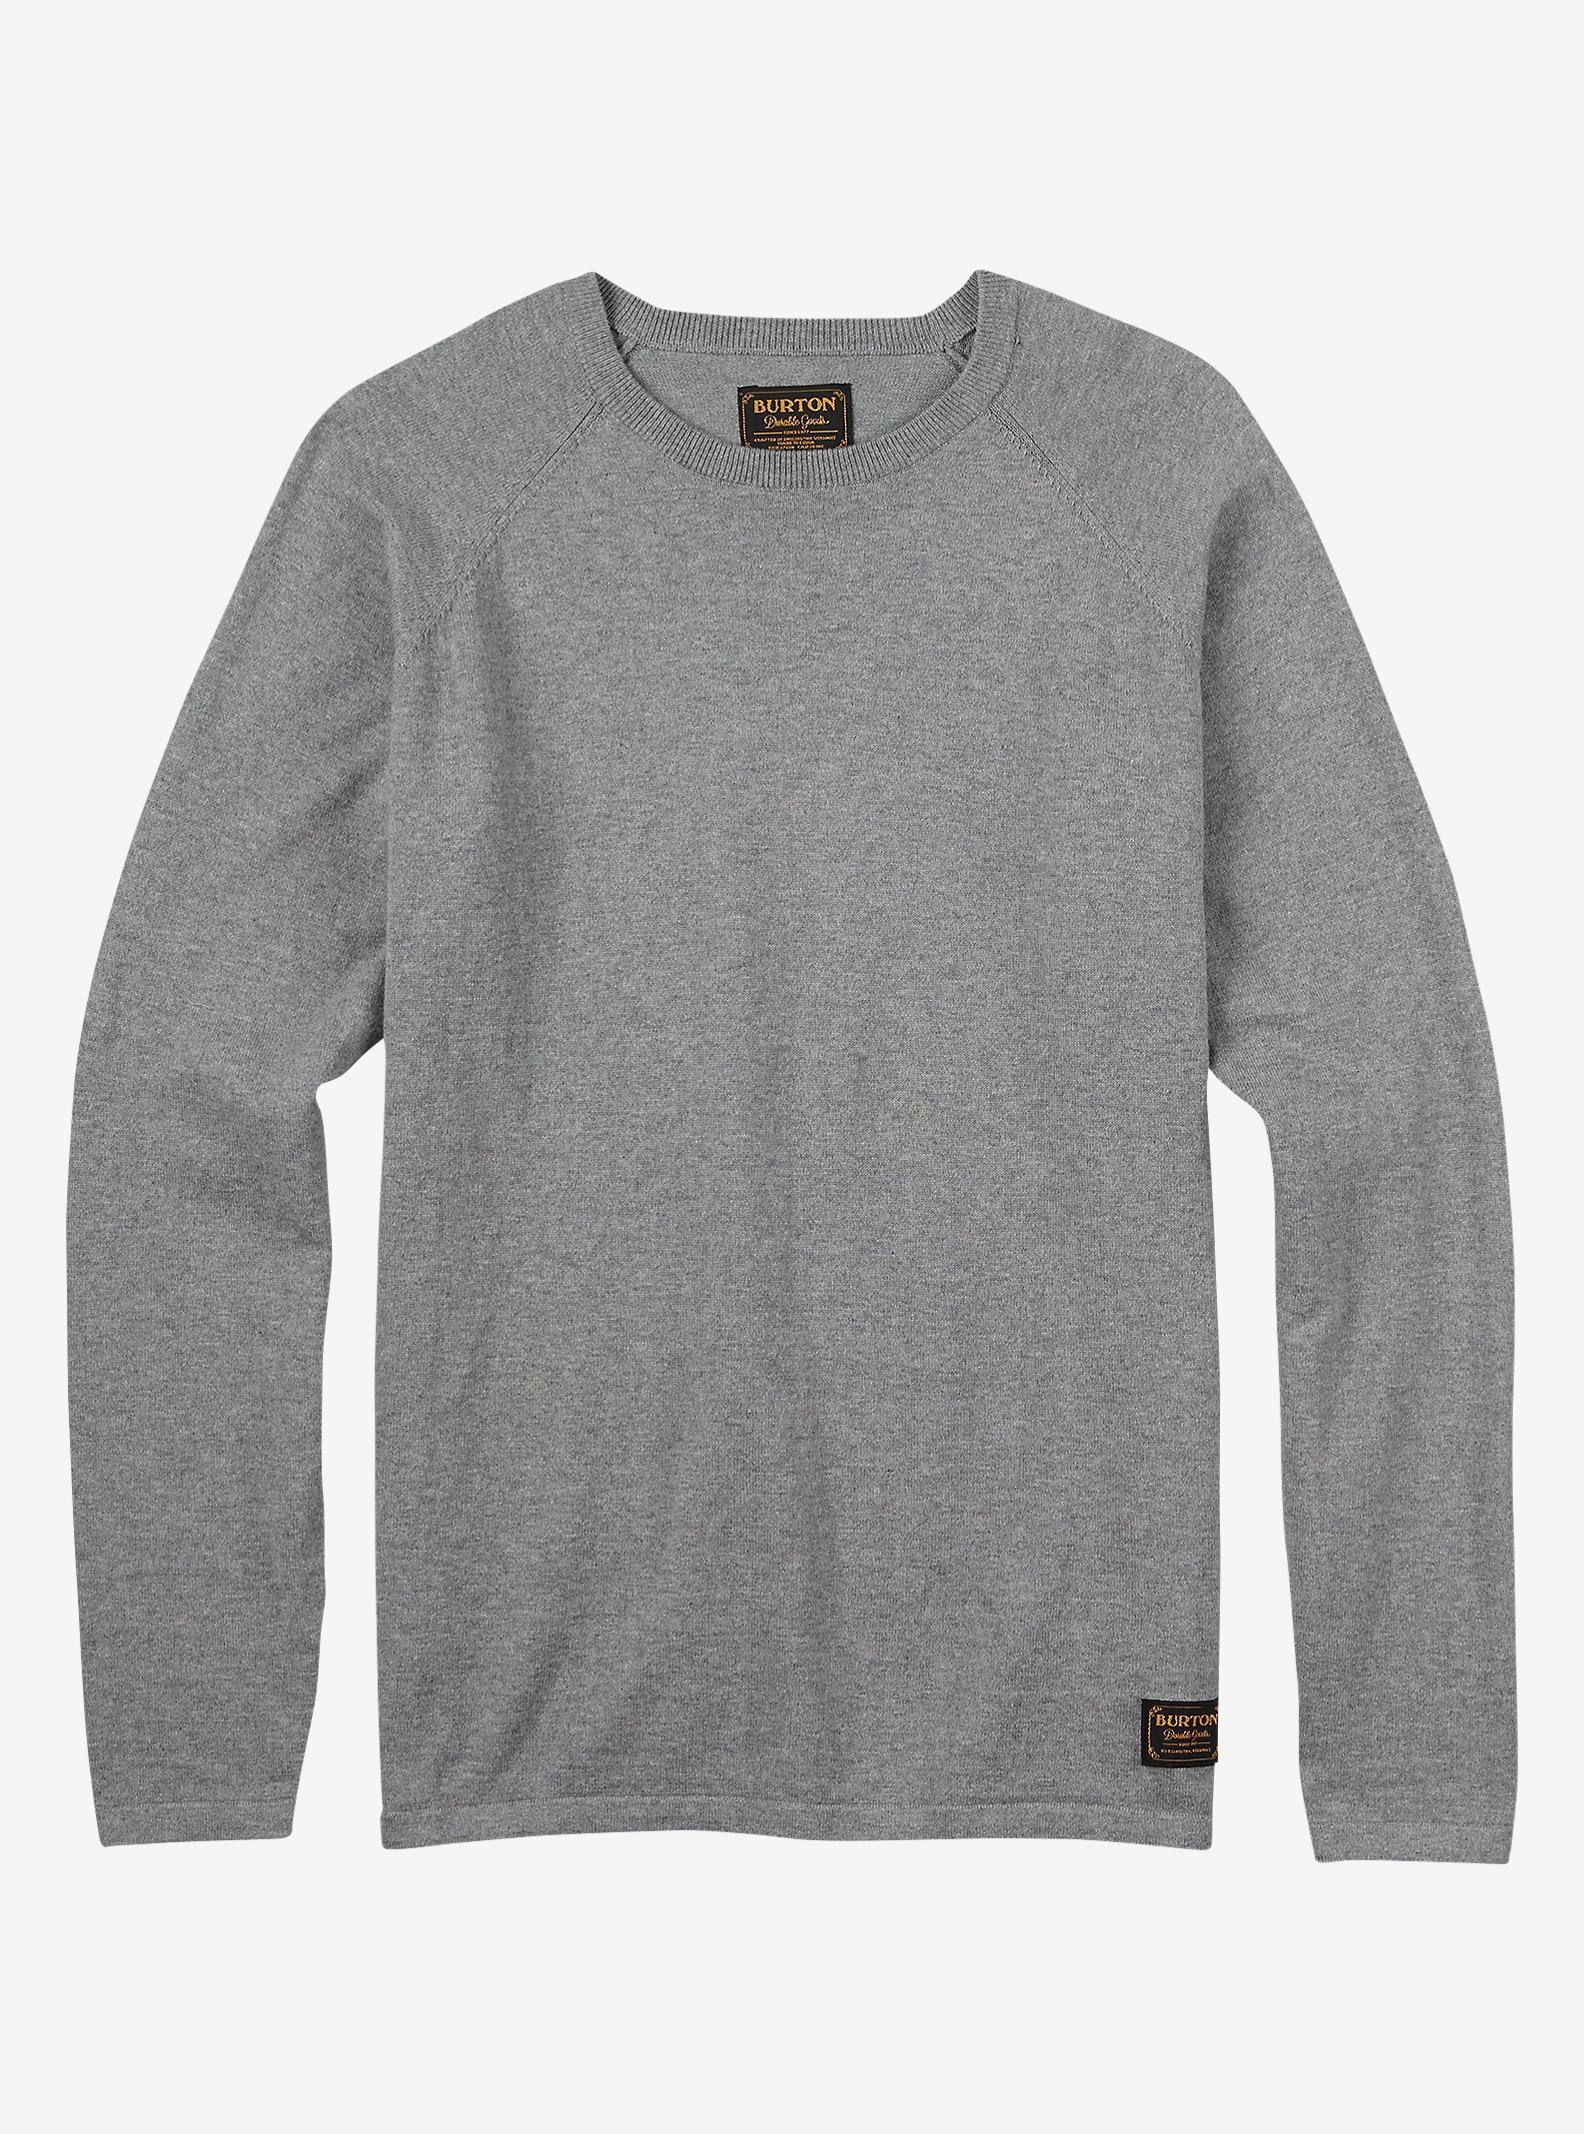 Burton Stowe Raglan Sweater shown in Monument Heather